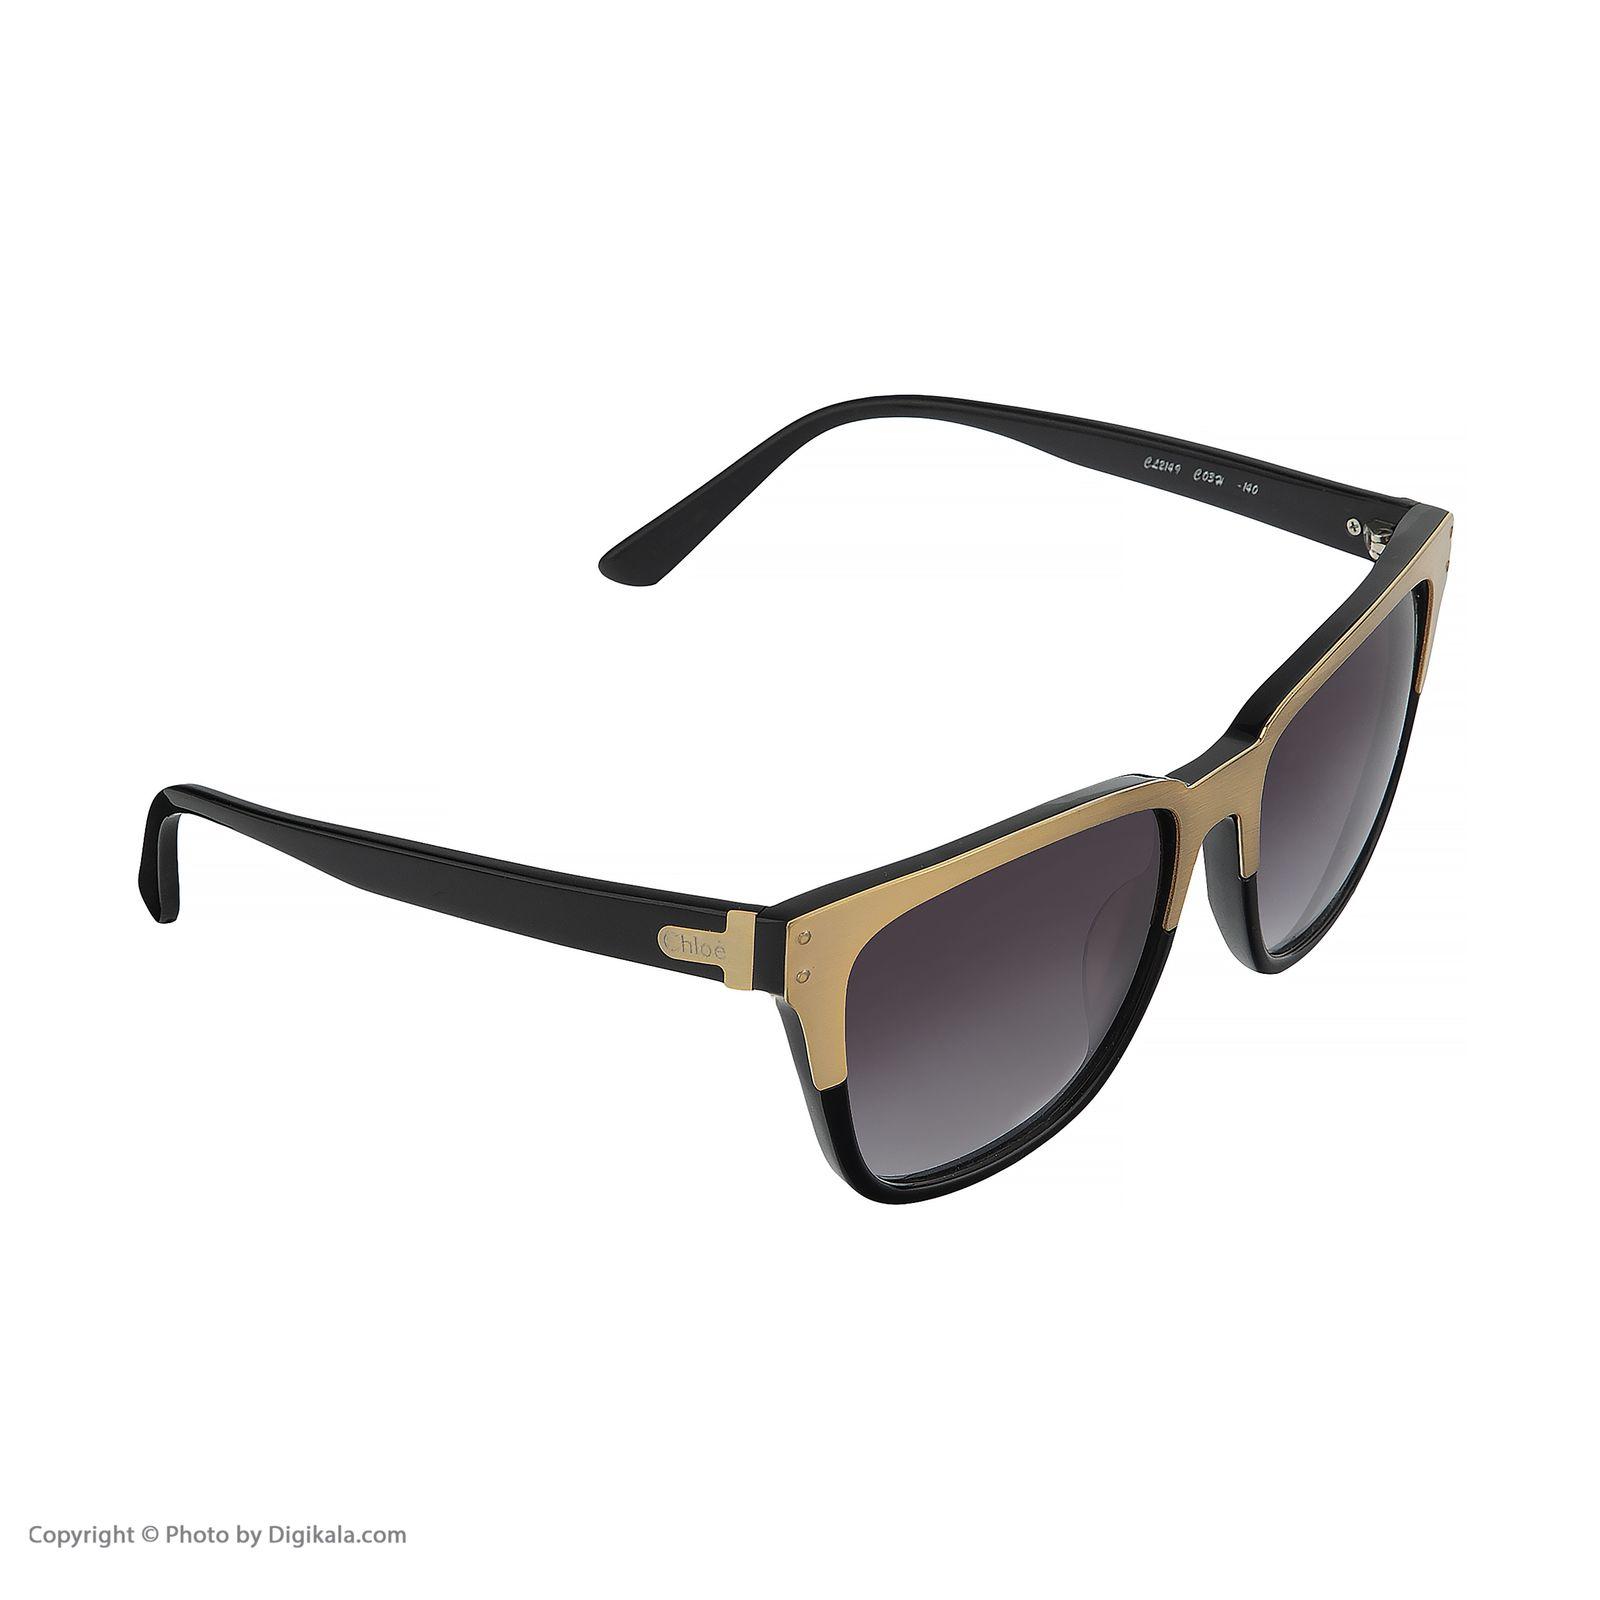 عینک آفتابی کلویی مدل 2149 -  - 6